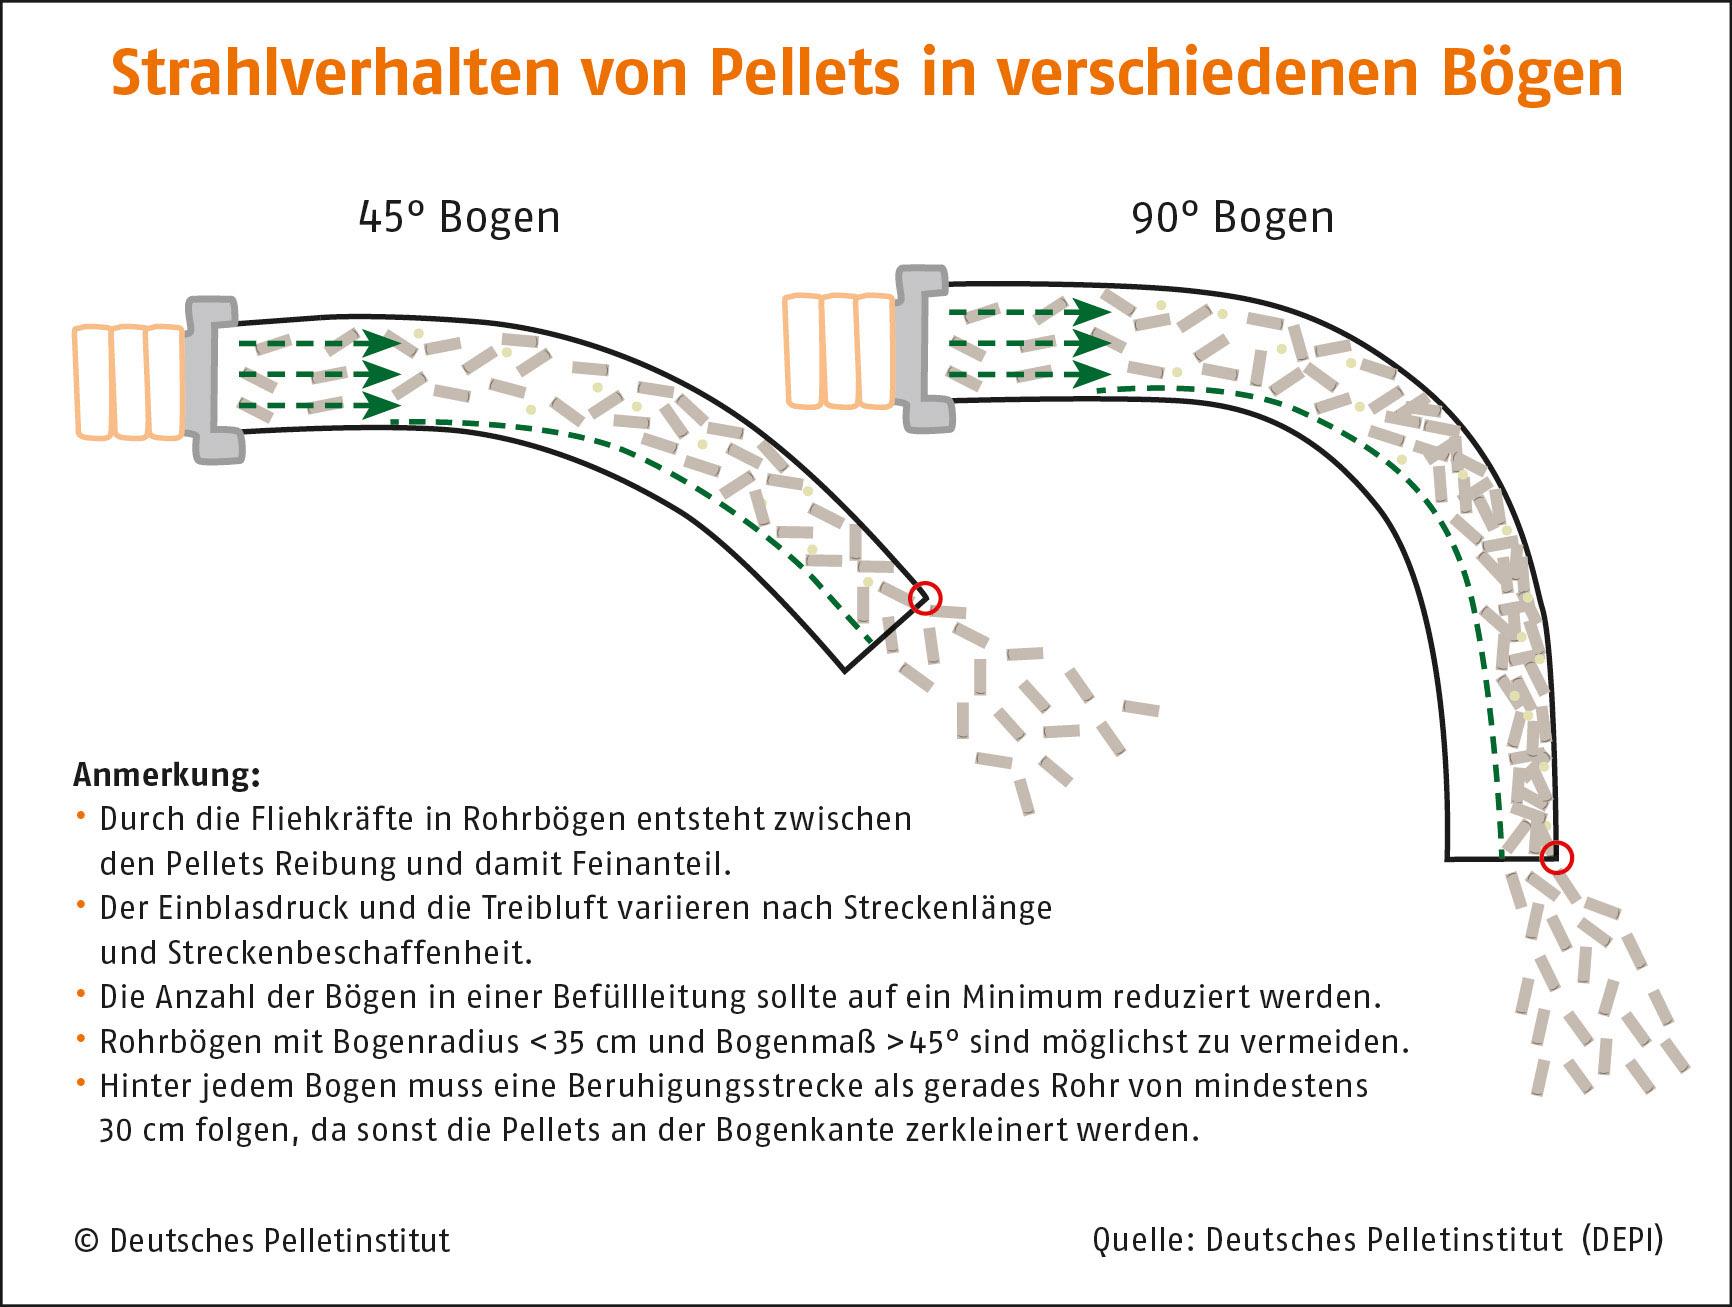 DEPI_Grafik_Strahlverhalten_Pellets